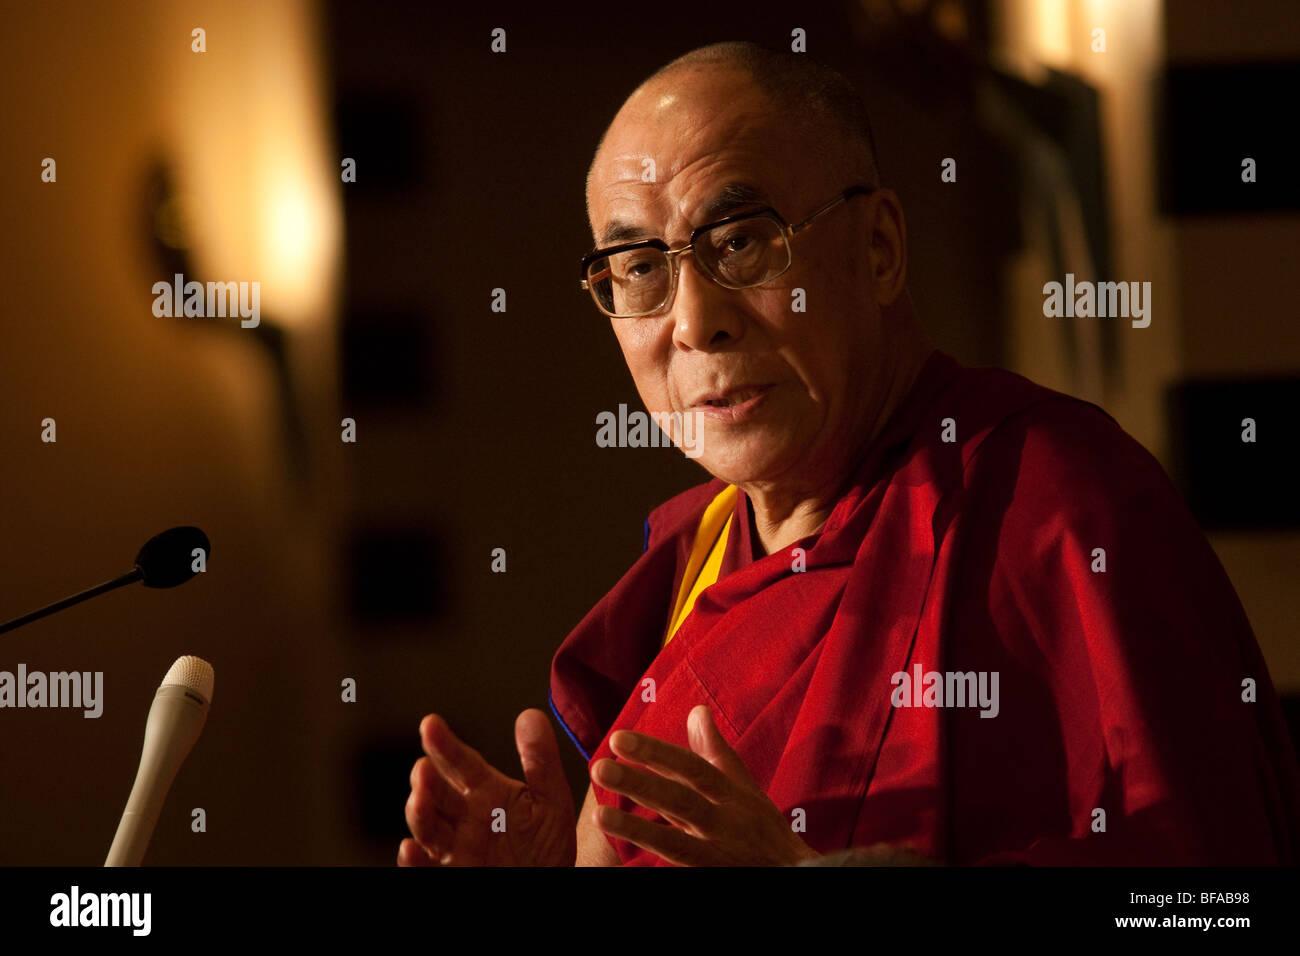 Dalai Lama Tenzin Gyatso, speaking at a function. Stock Photo